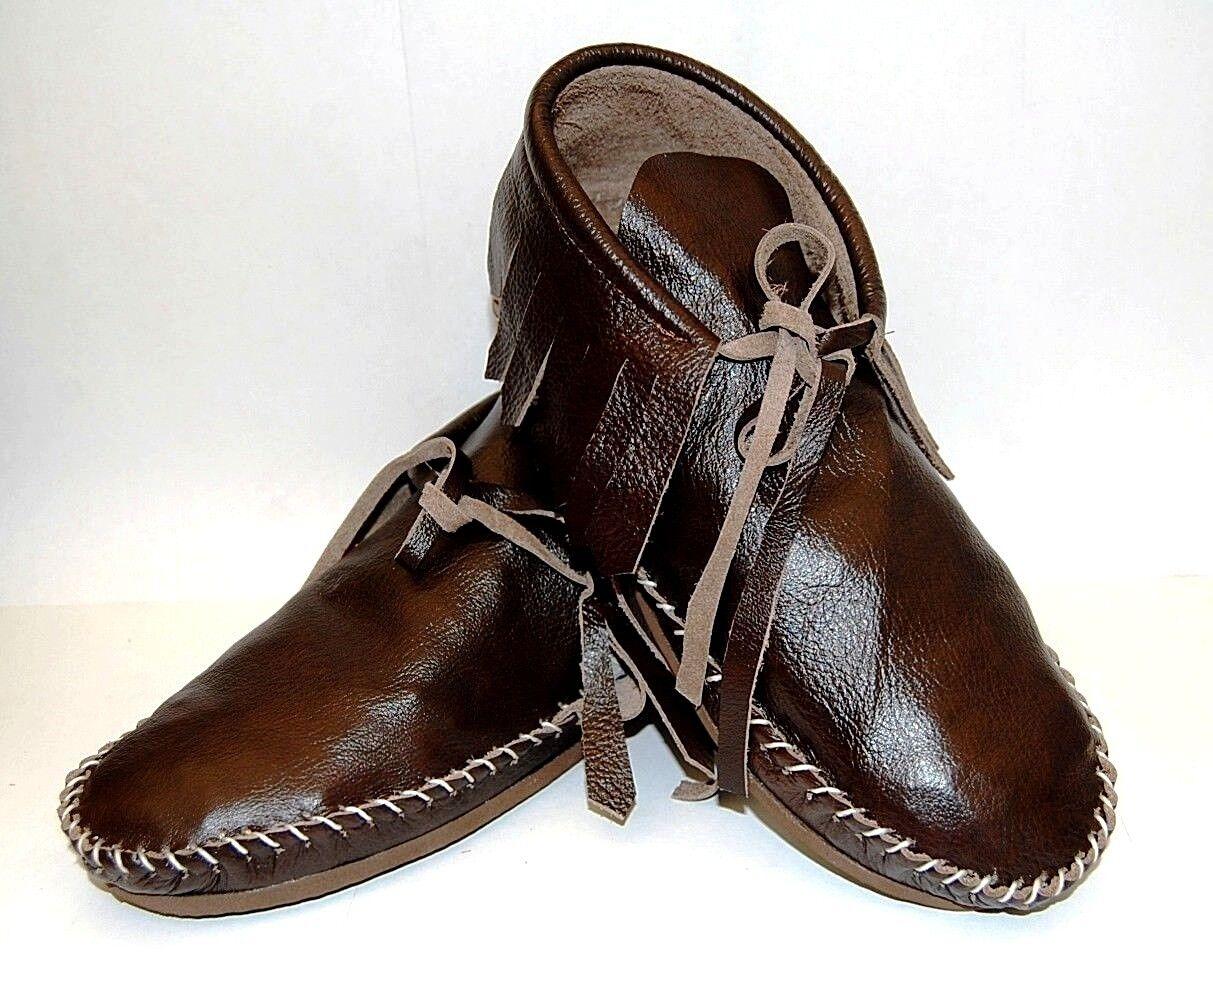 Braun Leder Soft Moccasins Damens low boot fringe Western Indian lace up all sz